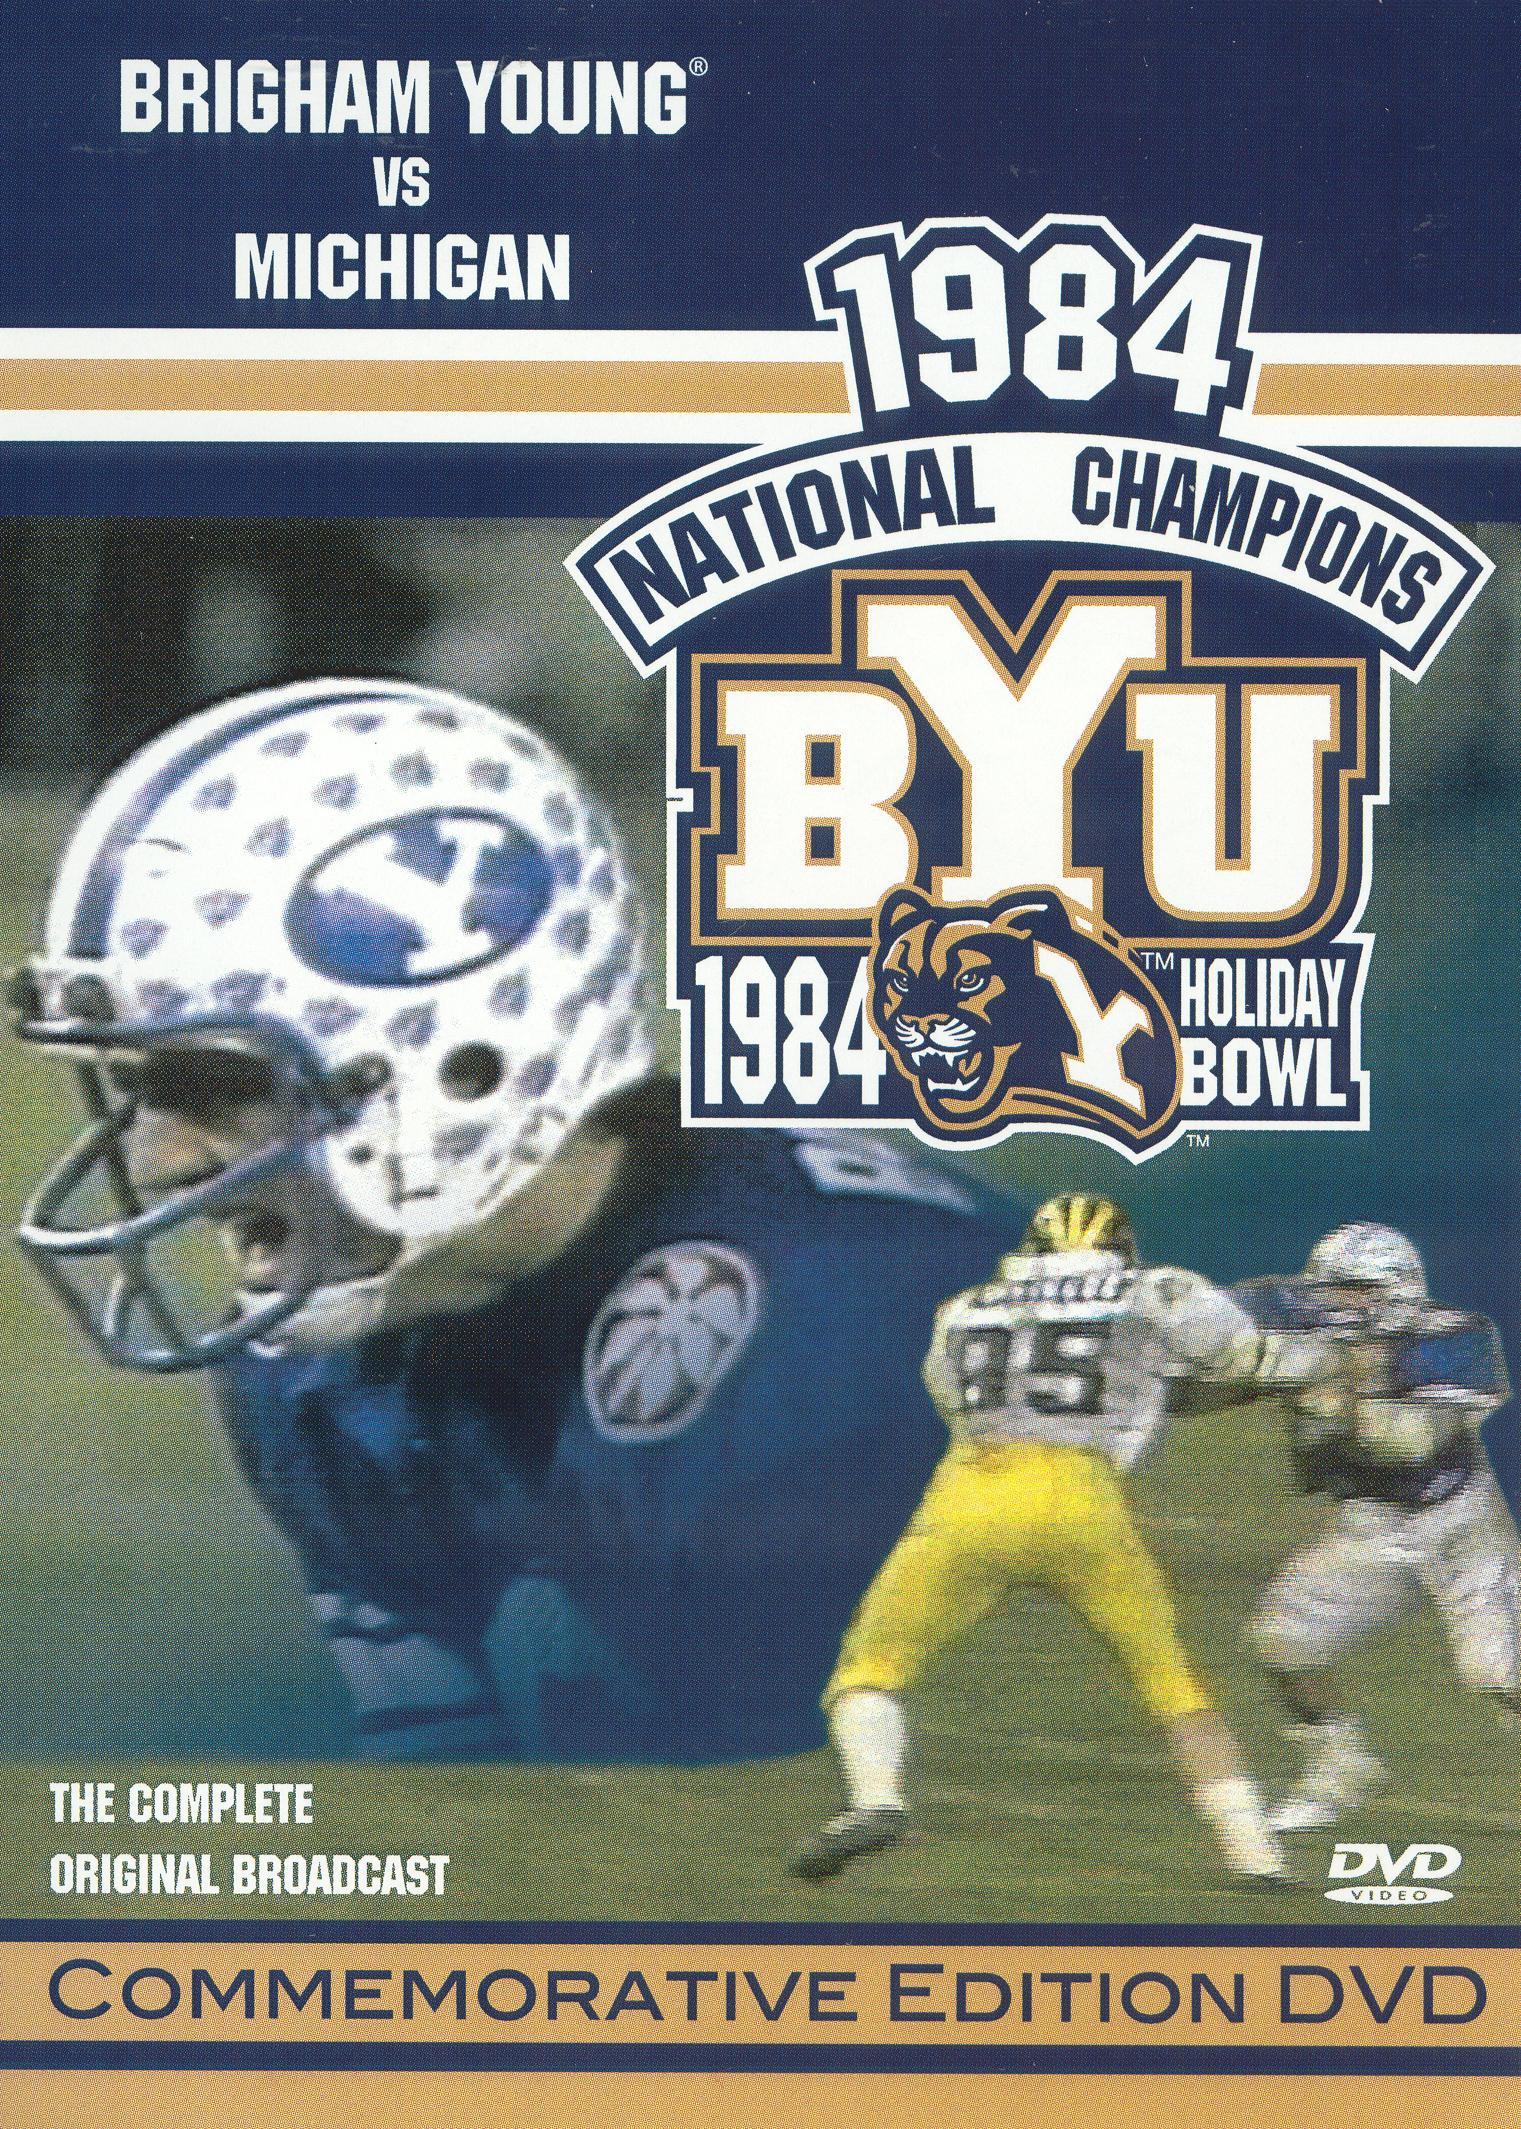 1984 Brigham Young vs. Michigan